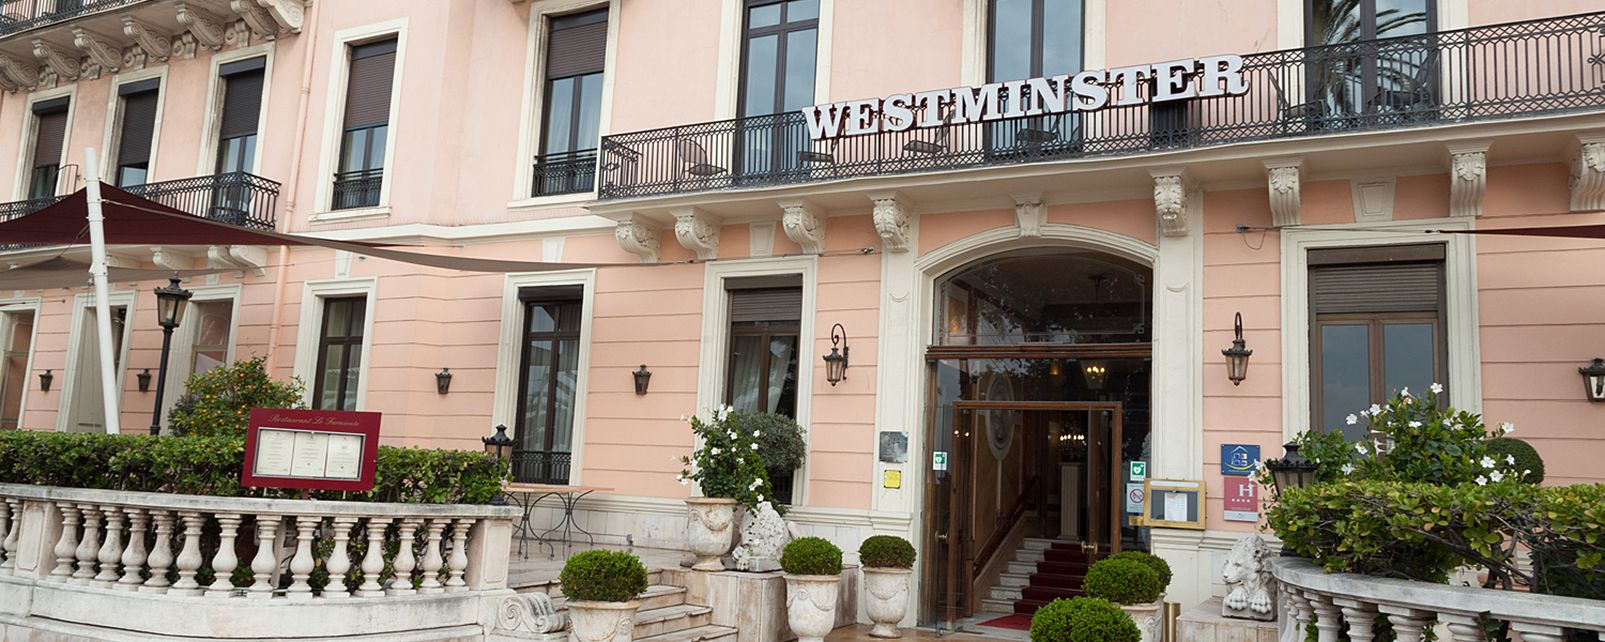 Hotel Westminster Hotel Nice